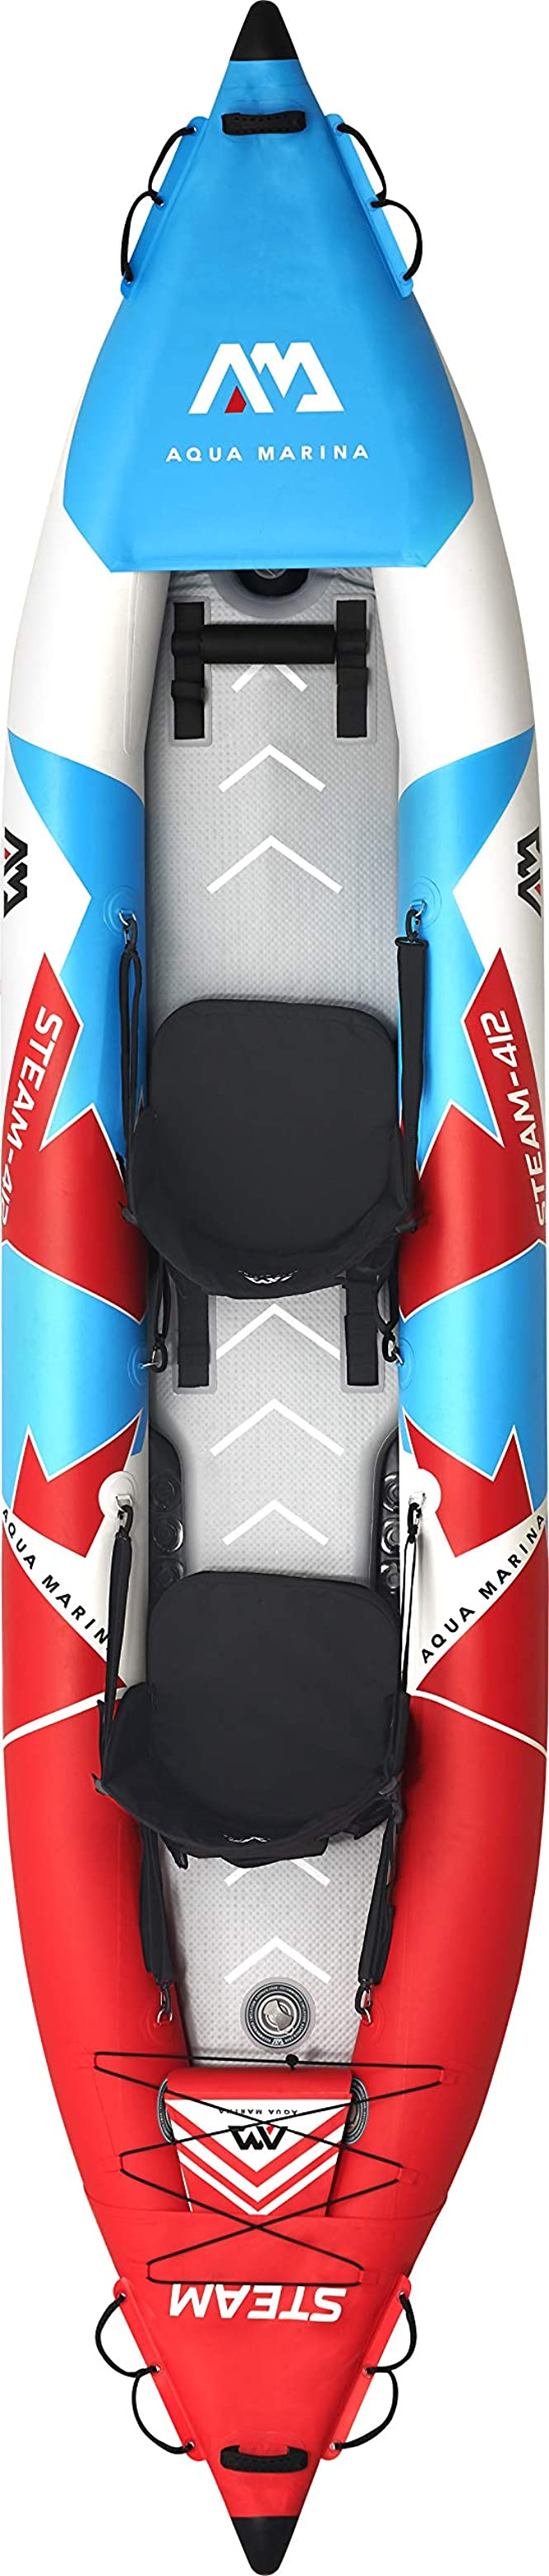 Kayak 2 posti aquamarina kayak vapore-412, uni ST-412